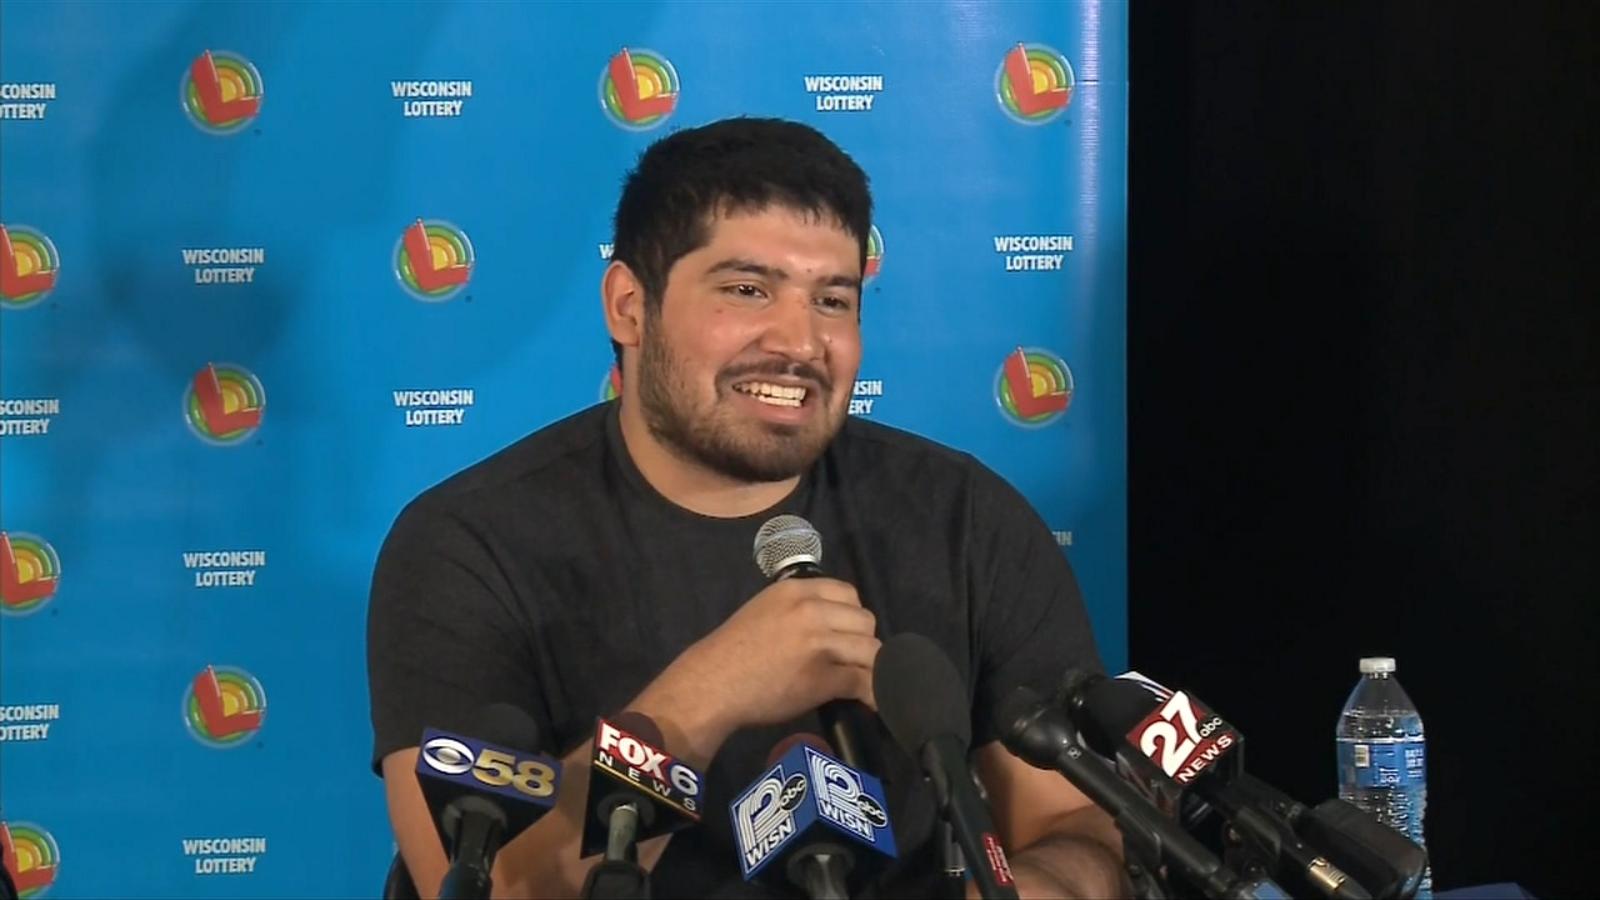 Manuel Franco Wisconsin Winner Of 7684m Powerball Jackpot Claims